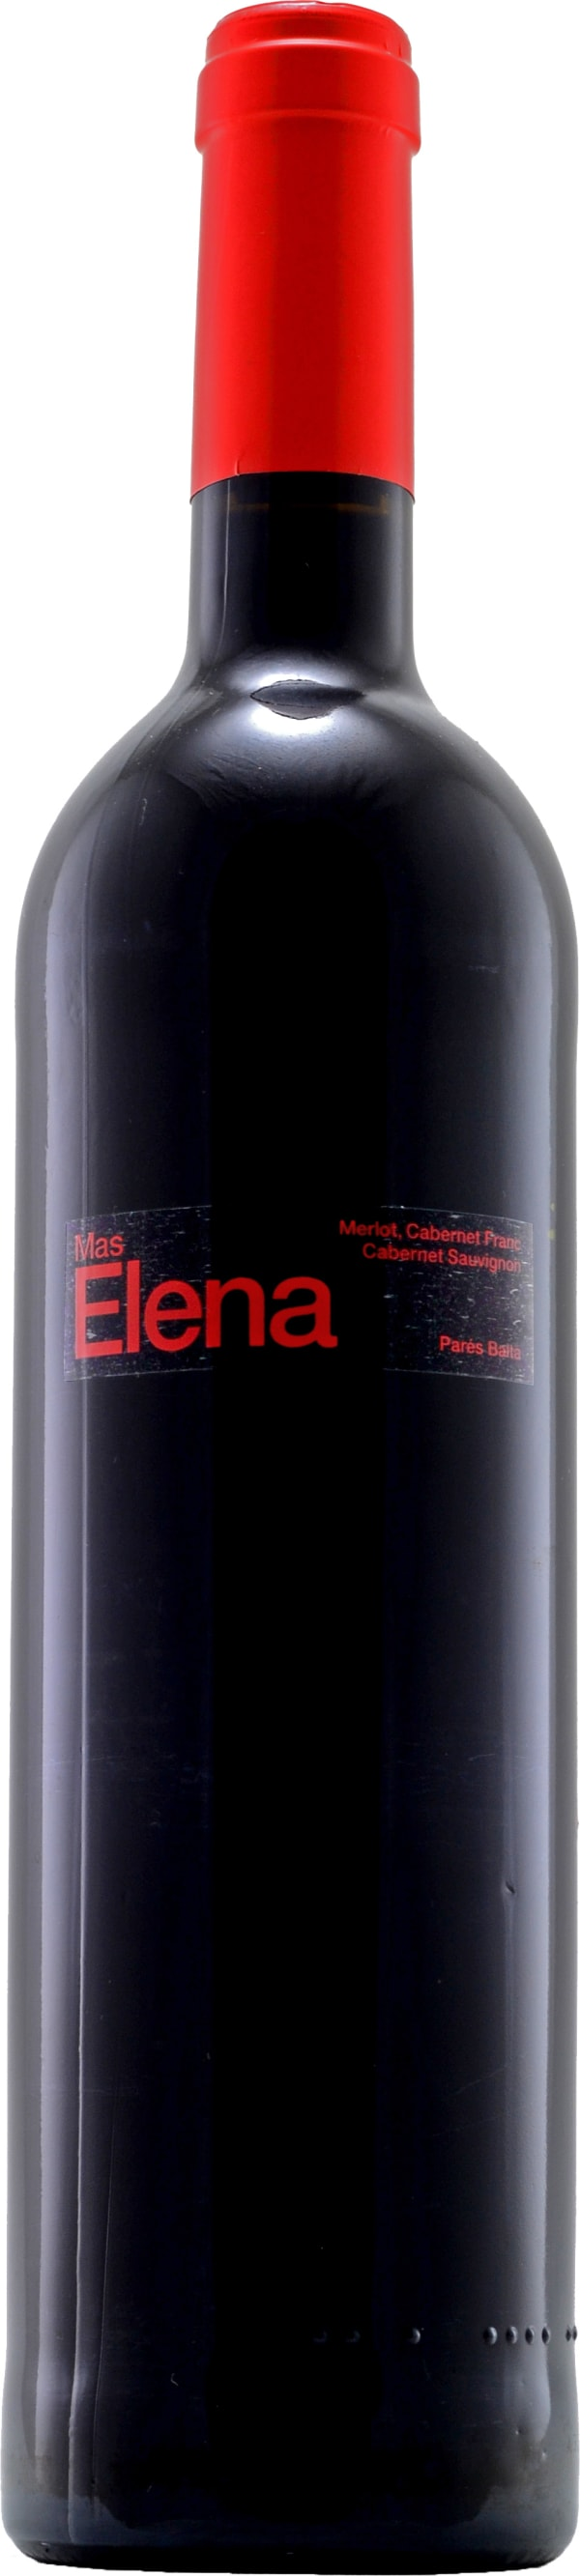 Mas Elena 2014